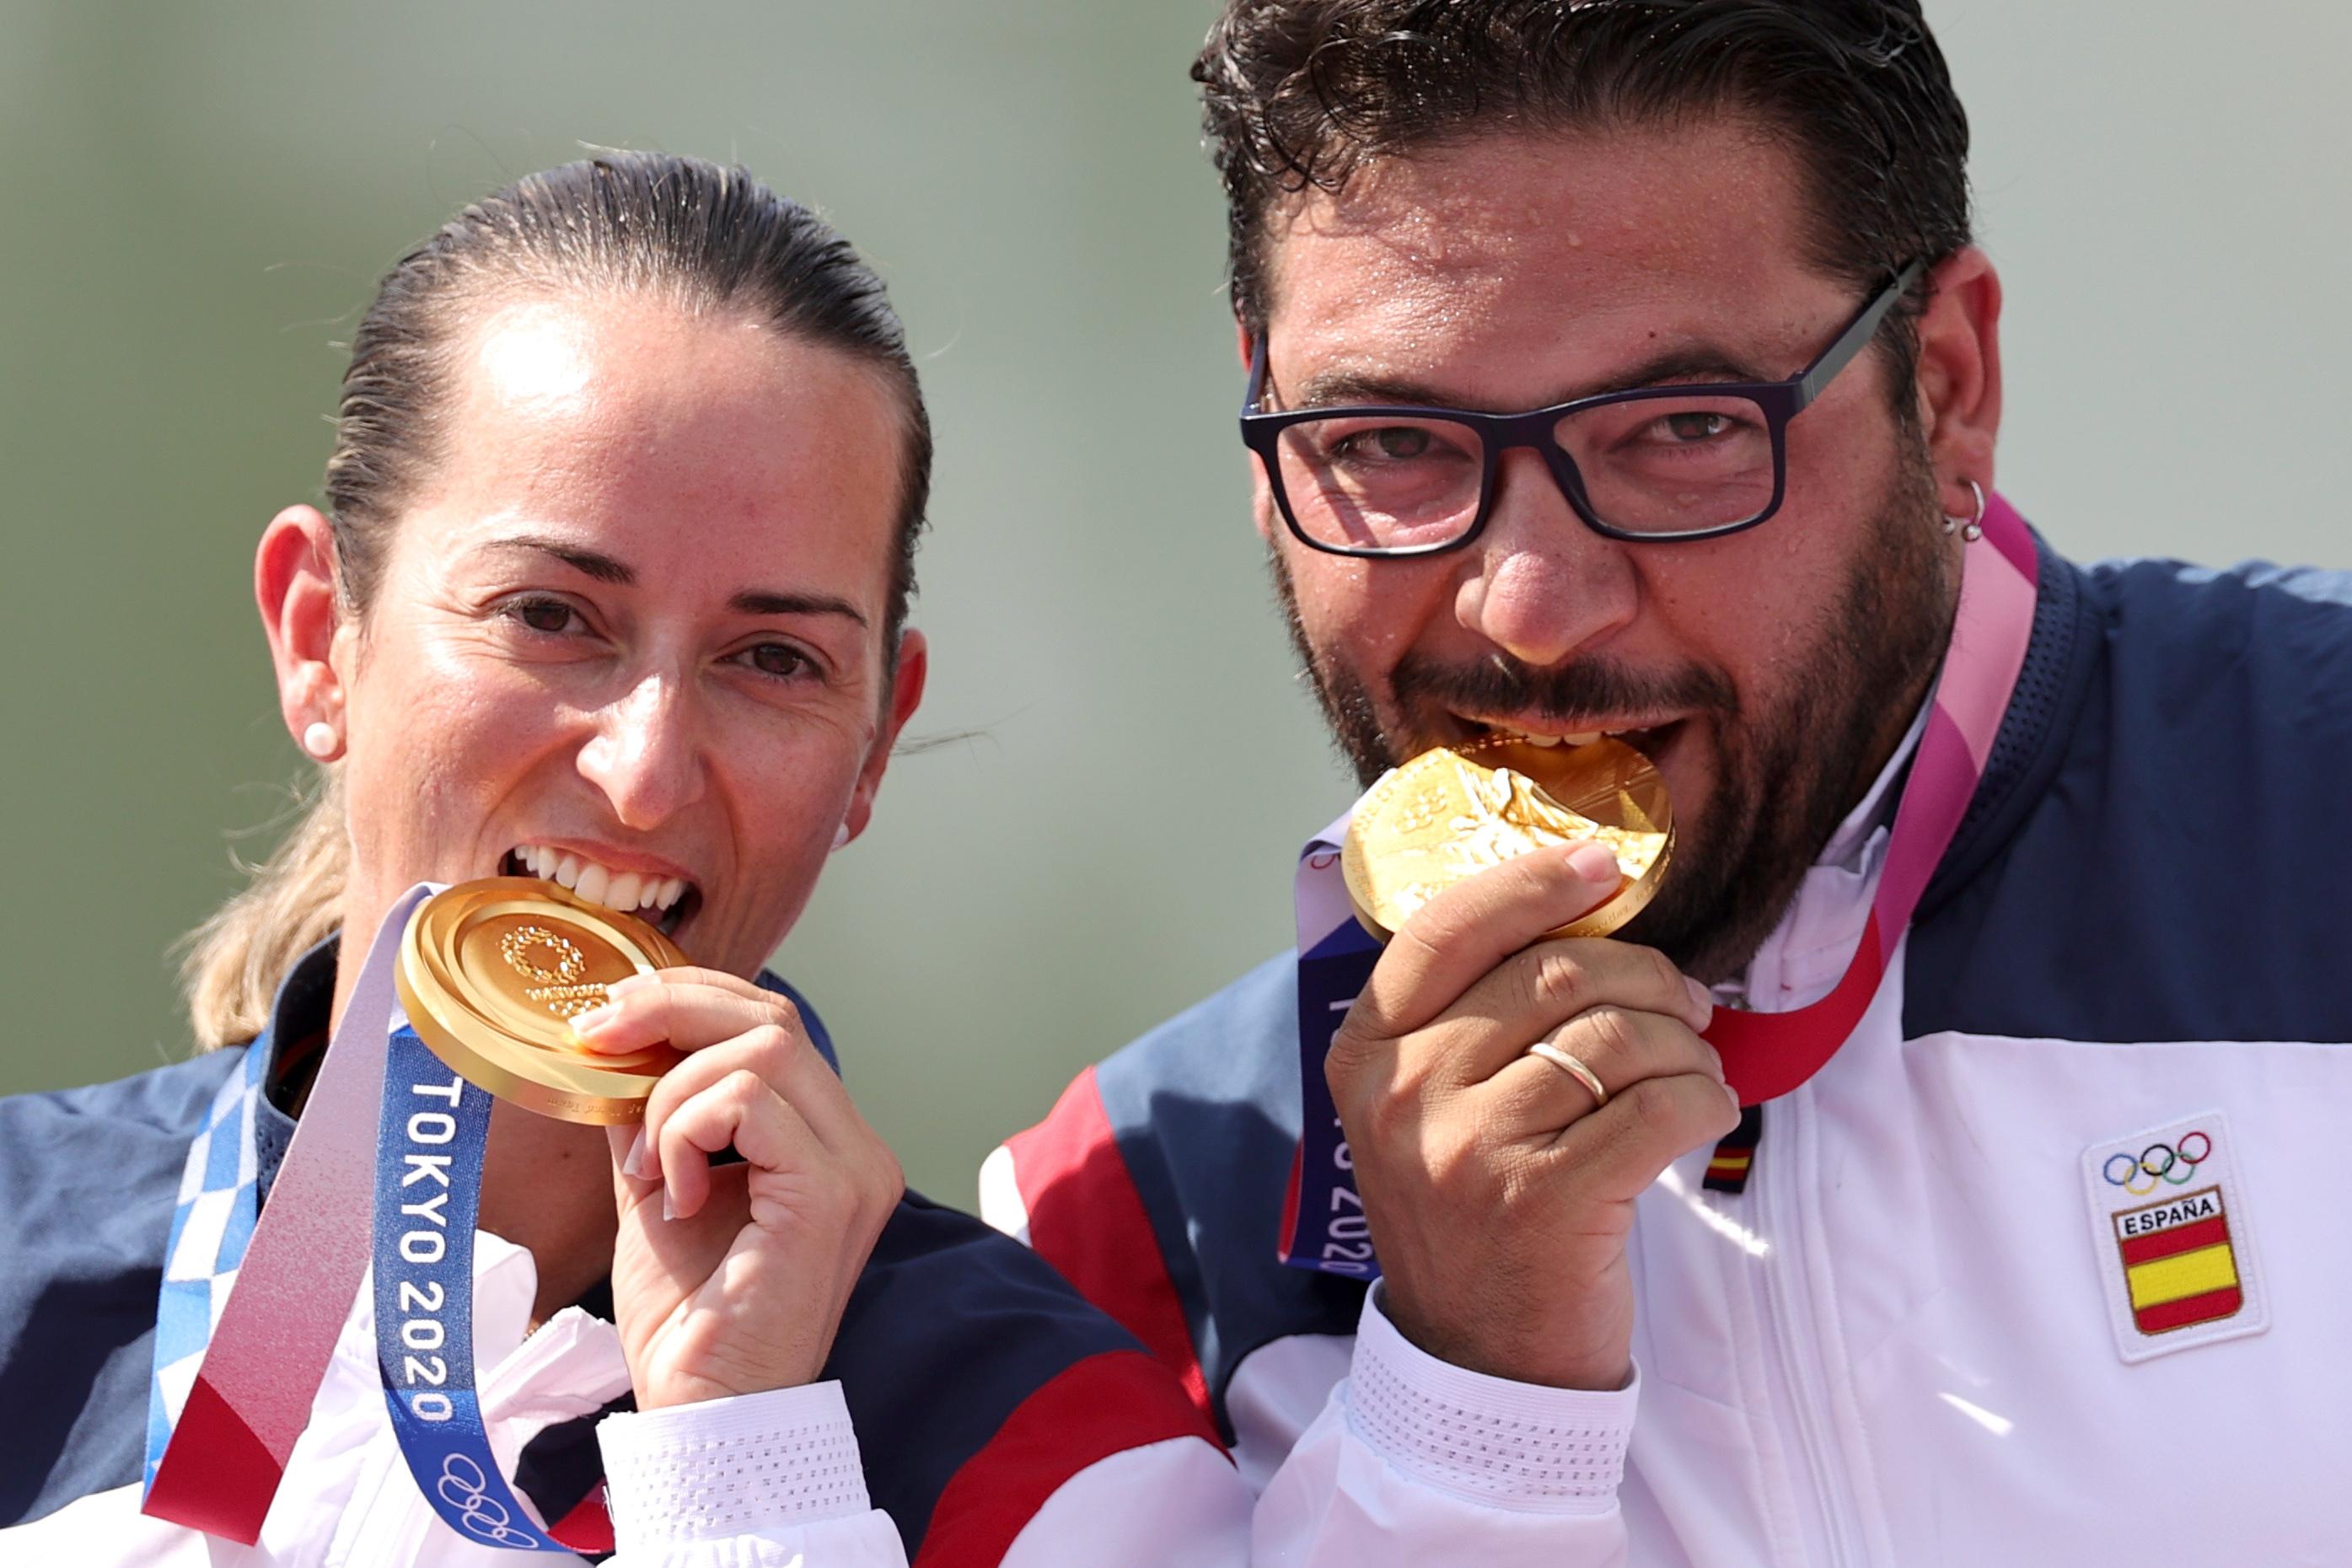 Fátima Galvez - Alberto fernandez - tiro olÍmpico - jjoo 2020 - juegos olimpicos